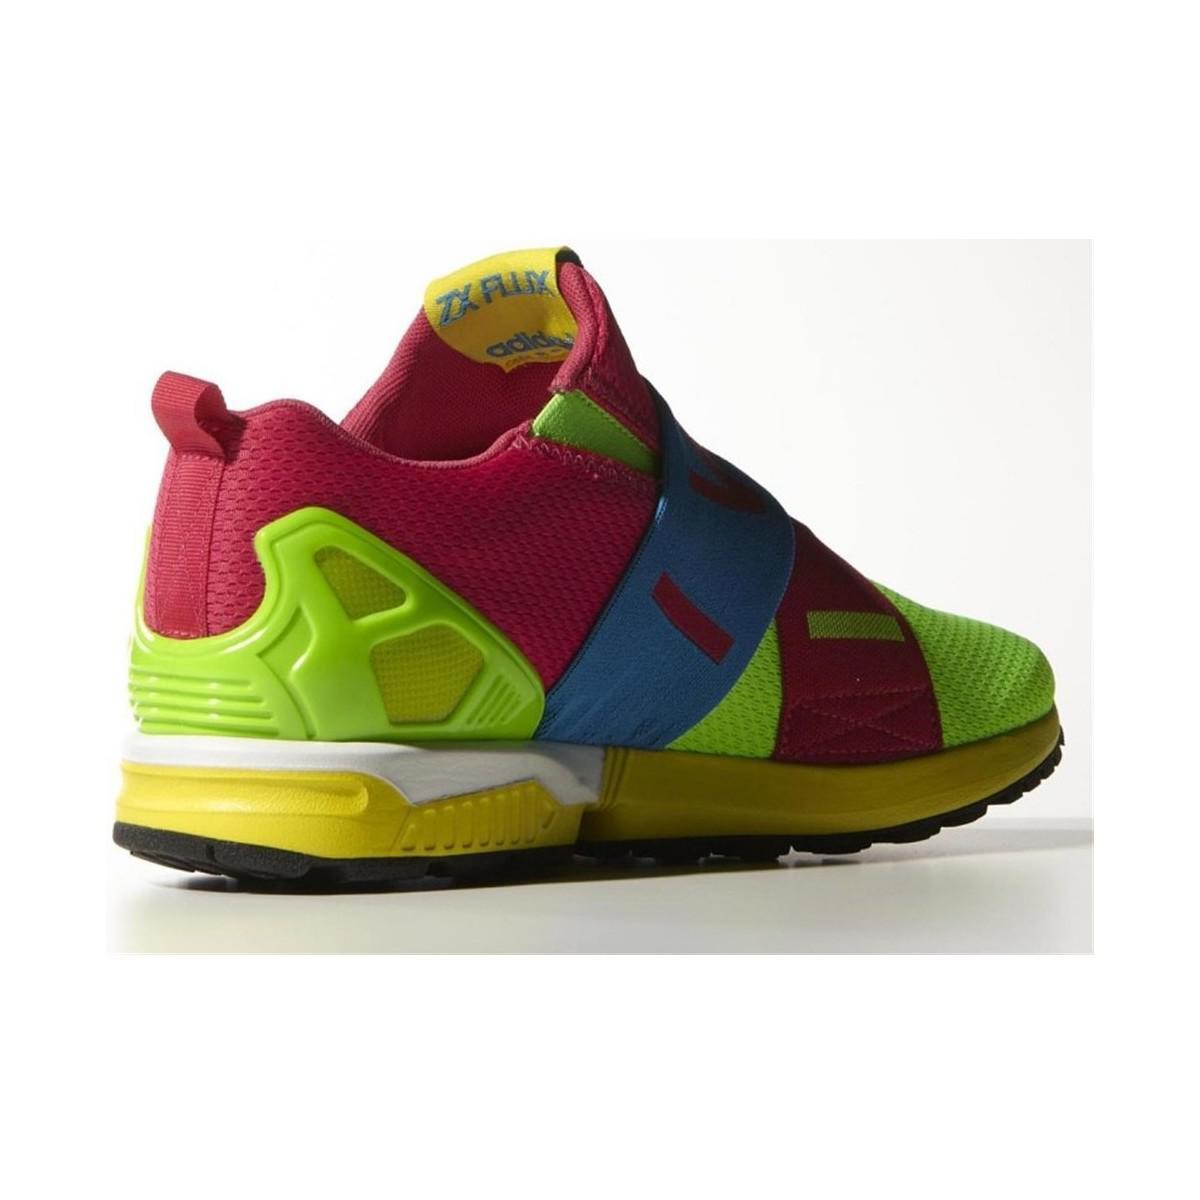 994f67769adac adidas Originals Zx Flux Slipon Men s Shoes (trainers) In Blue in ...